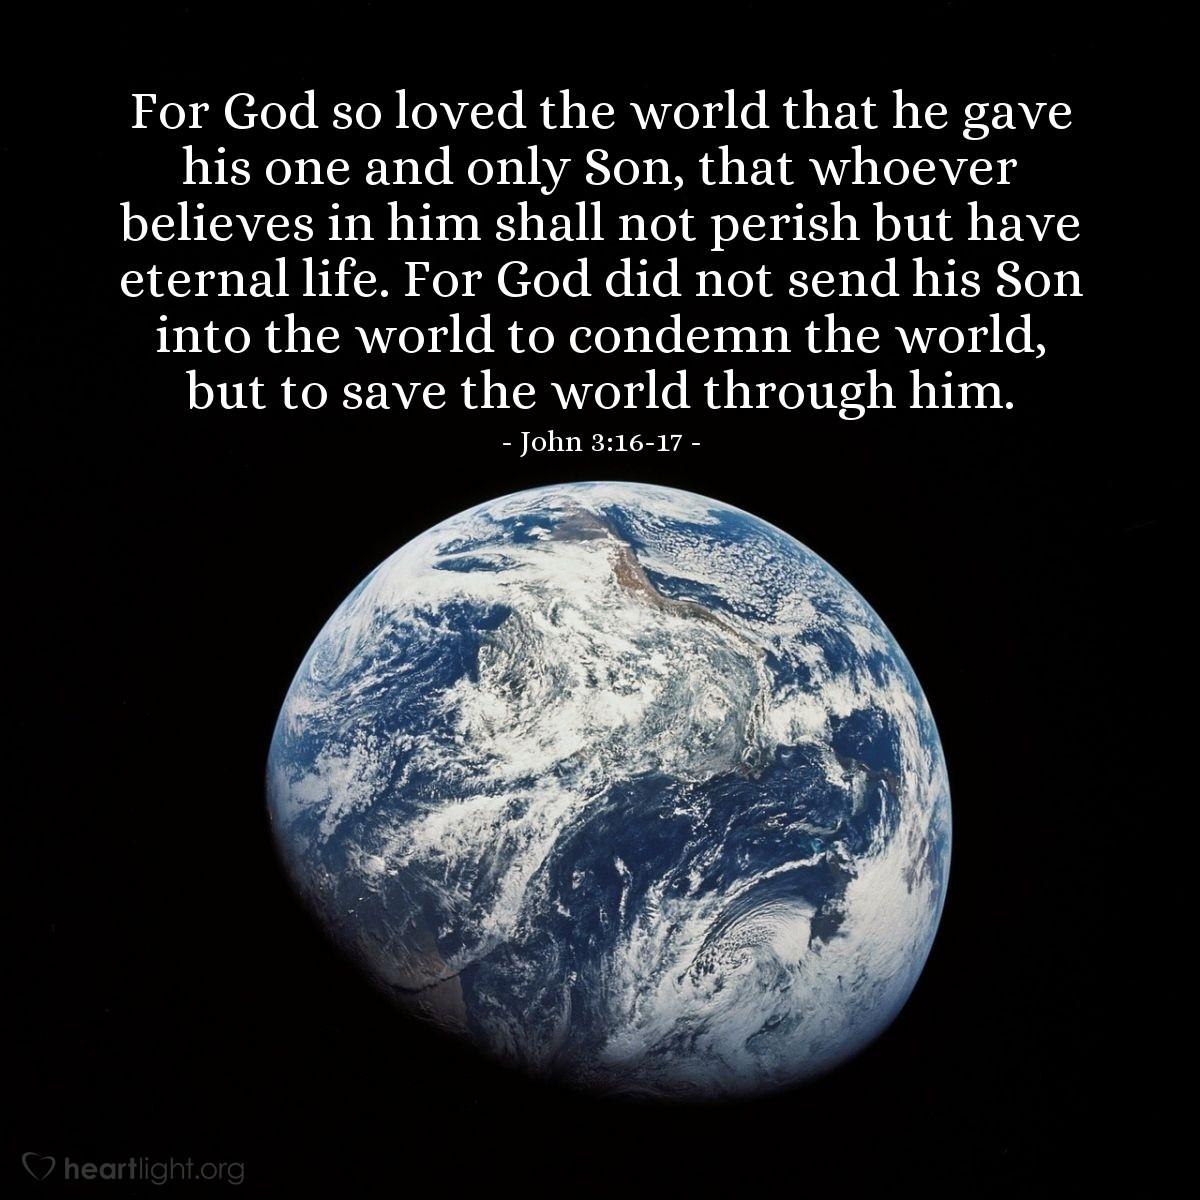 Inspirational illustration of John 3:16-17